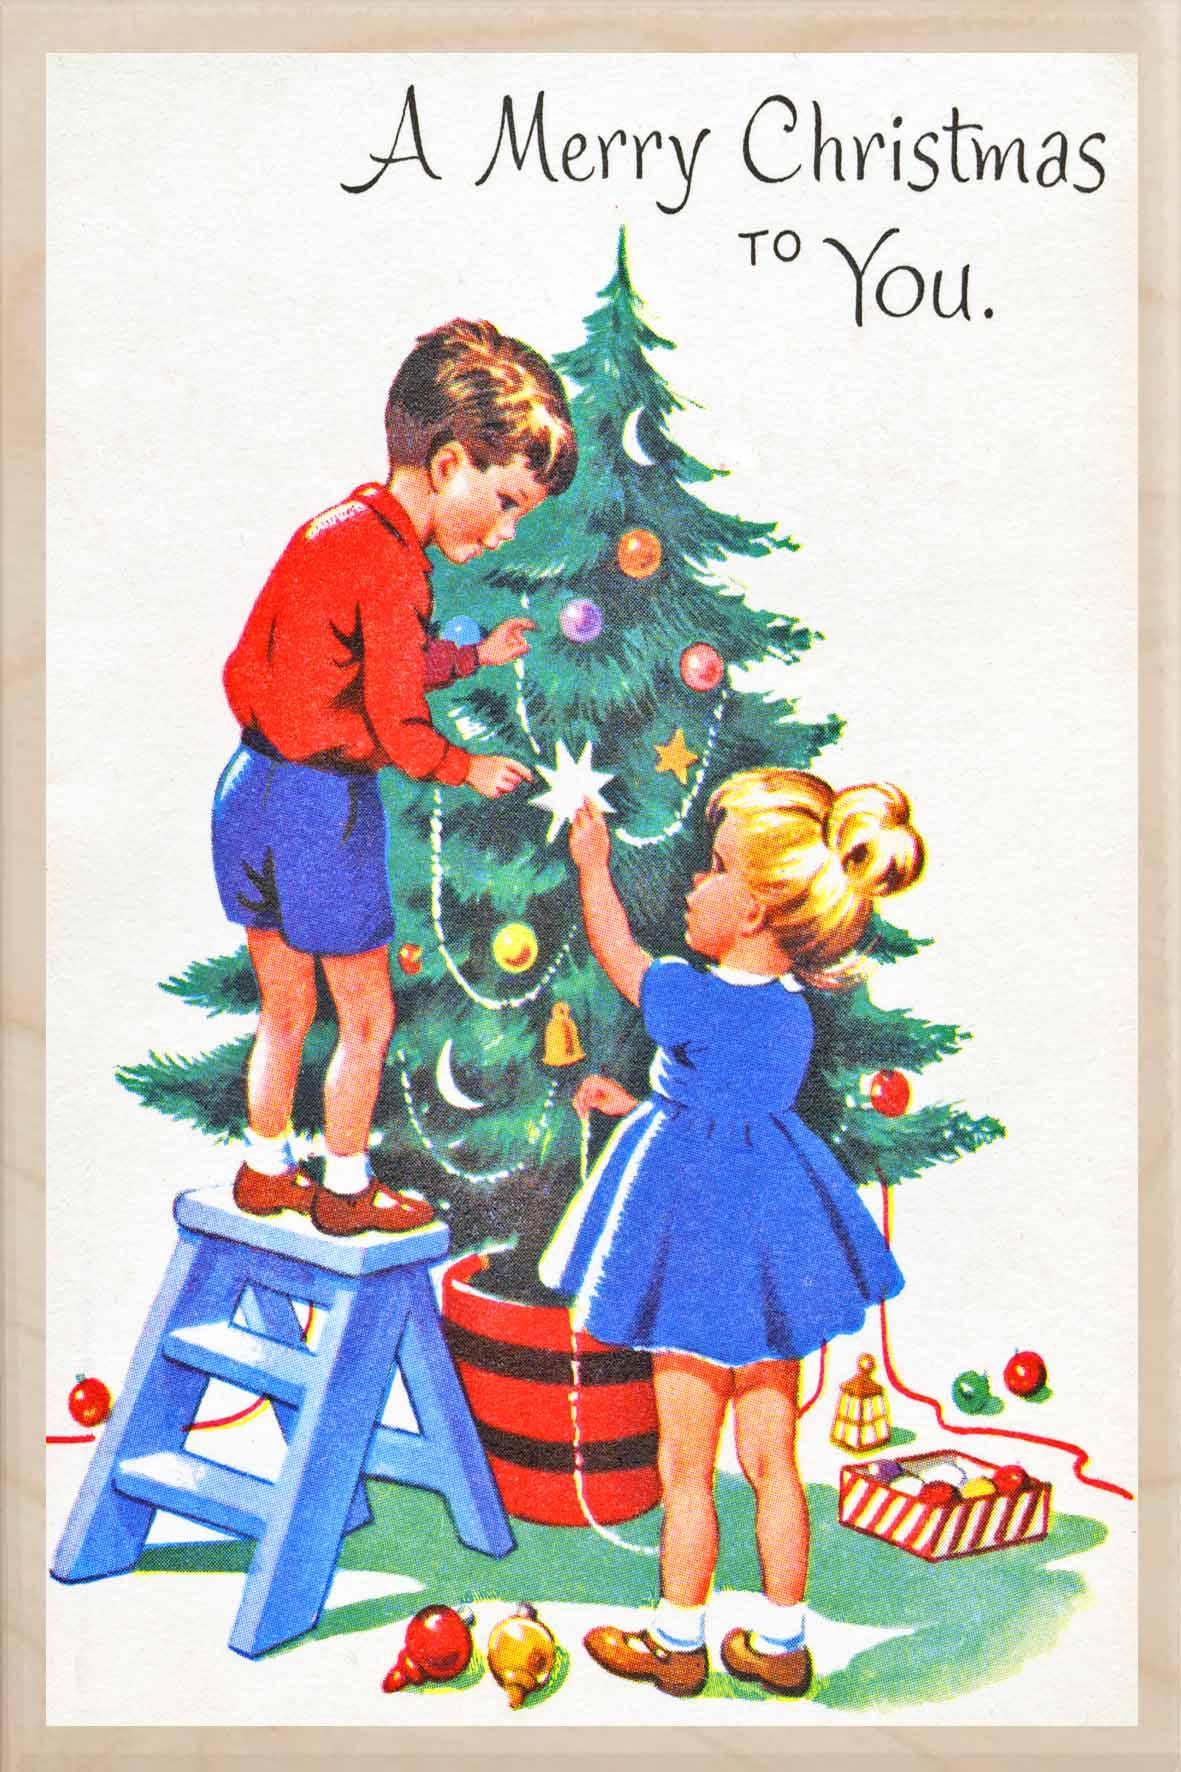 christmas tree the wooden postcard company houten postkaart MED 12194.jpg